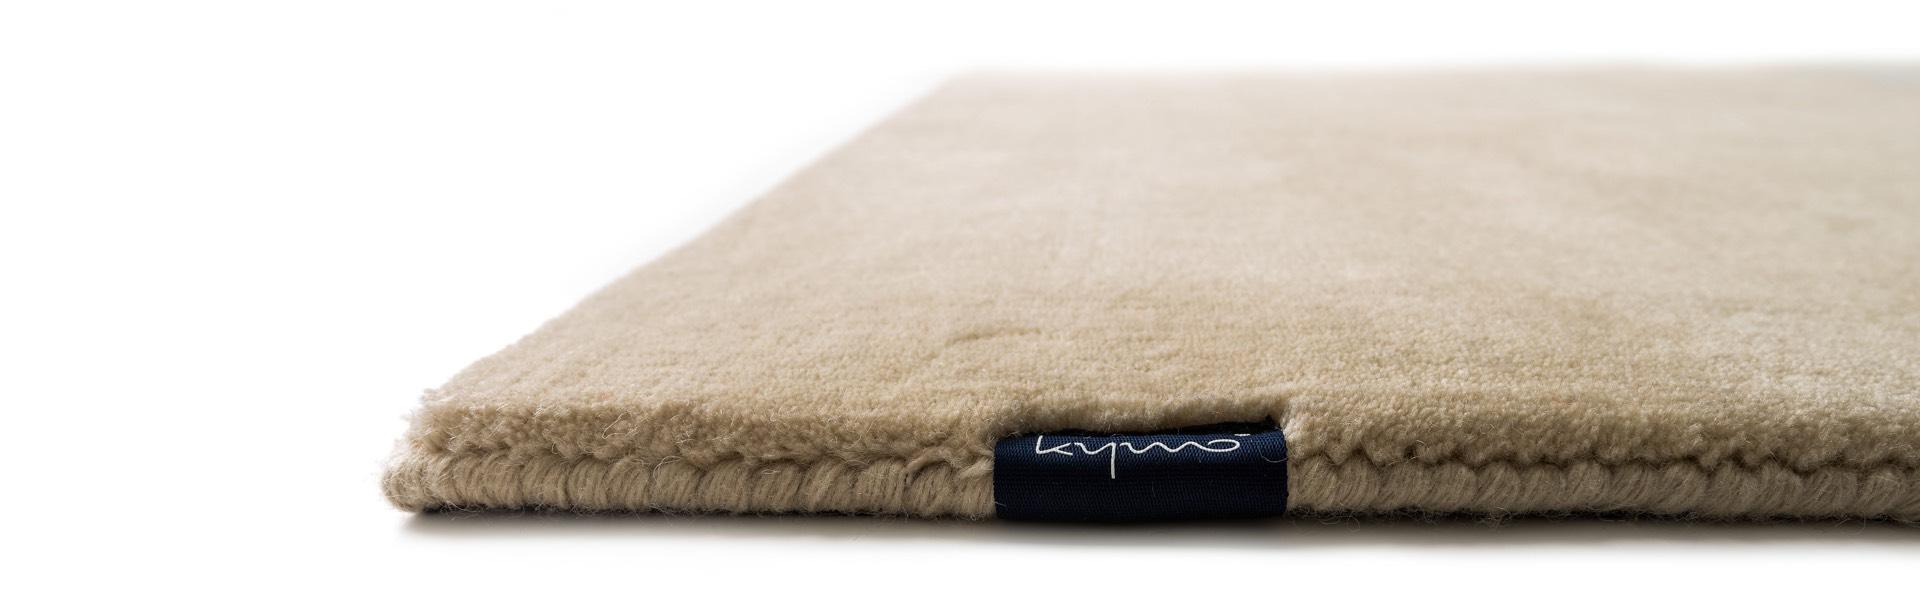 The Loft Studio NYC Raw Wool Edition